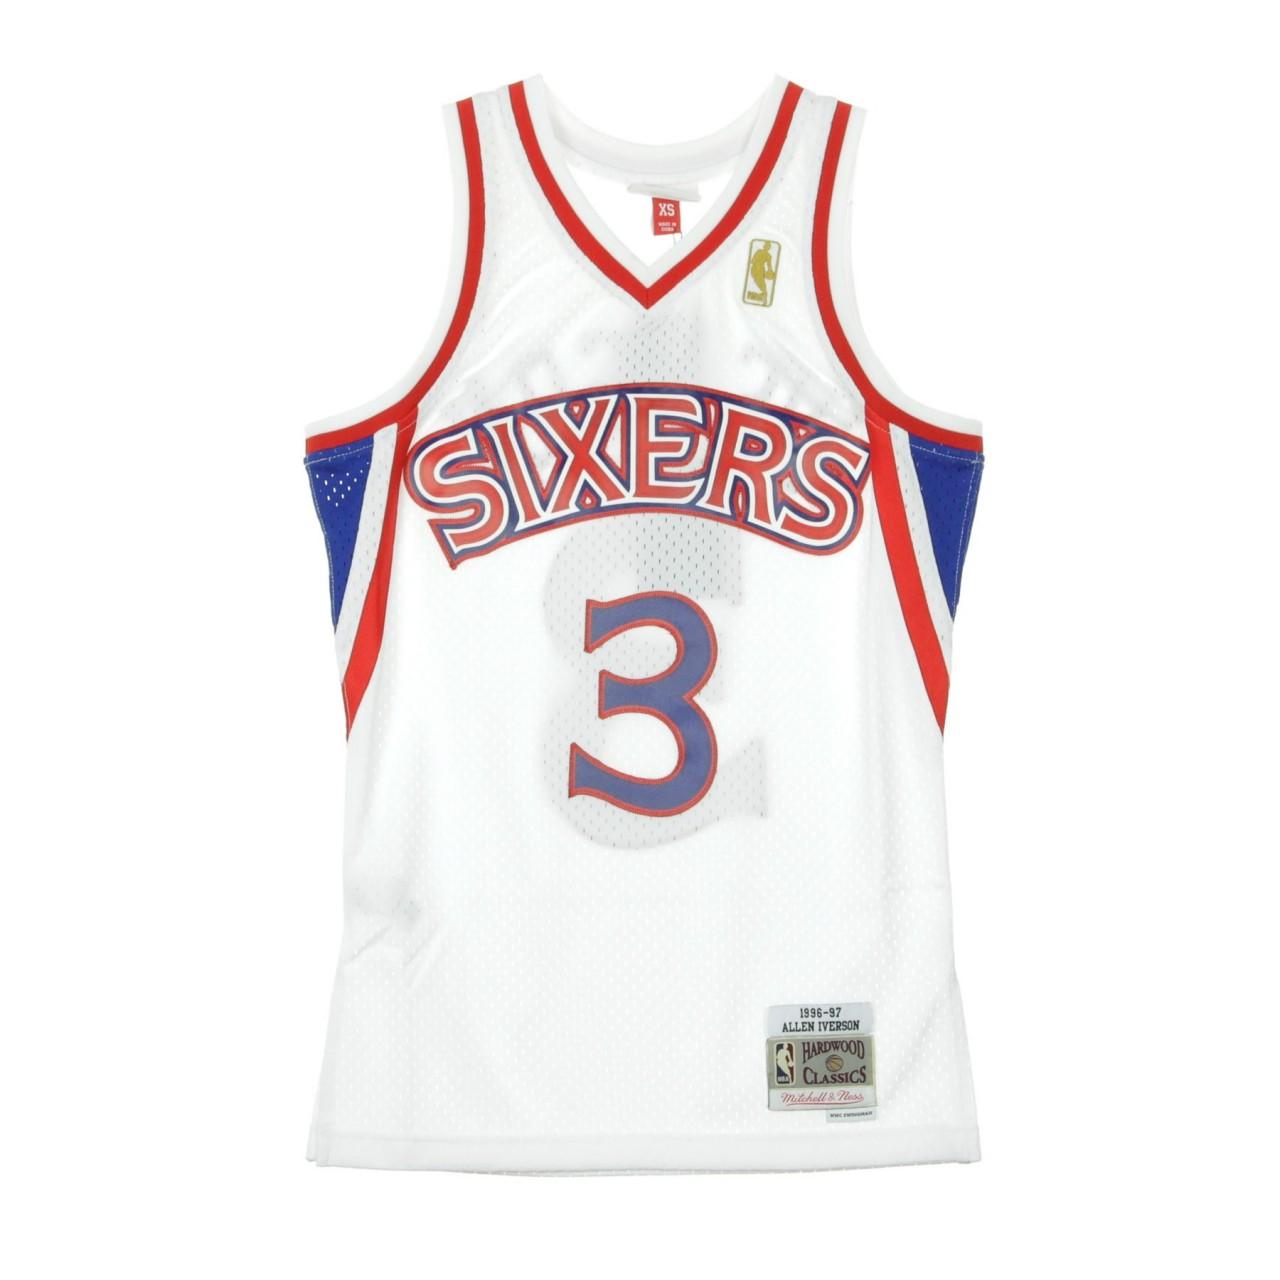 MITCHELL & NESS NBA SWINGMAN JERSEY HARDWOOD CLASSICS NO.3 ALLEN IVERSON 1996-97 PHI76E HOME SMJYGS18198-P76WHIT96AIV